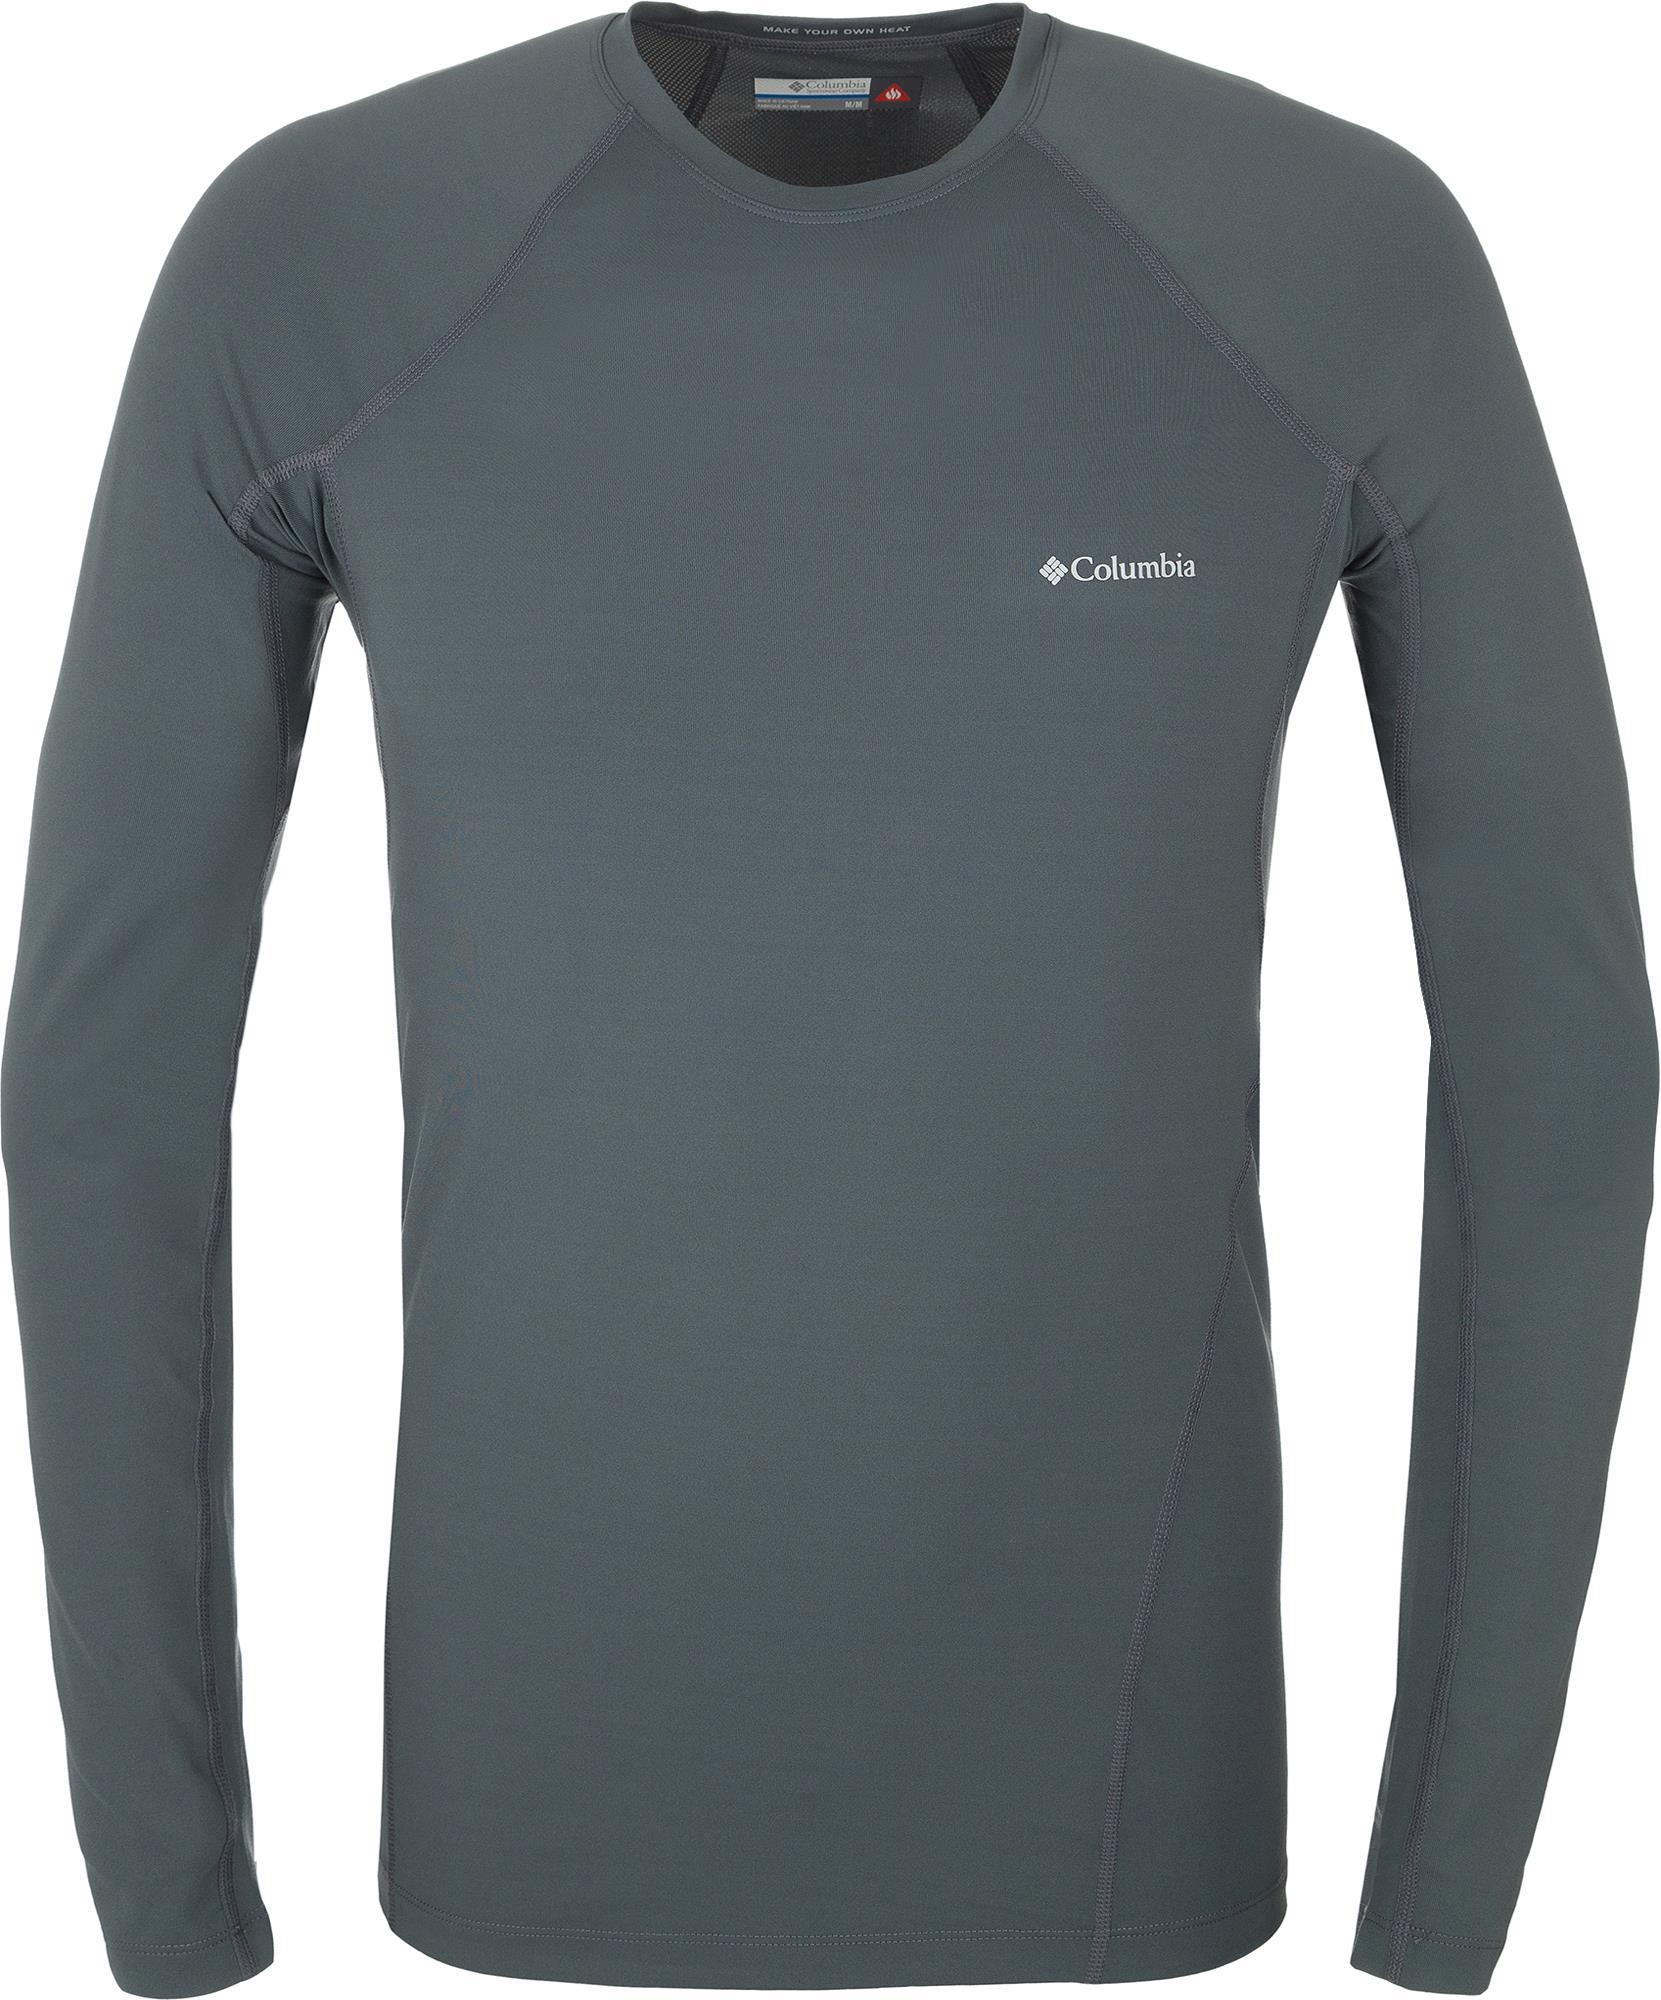 Термобелье футболка Columbia Midweight Stretch Long Sleeve Top